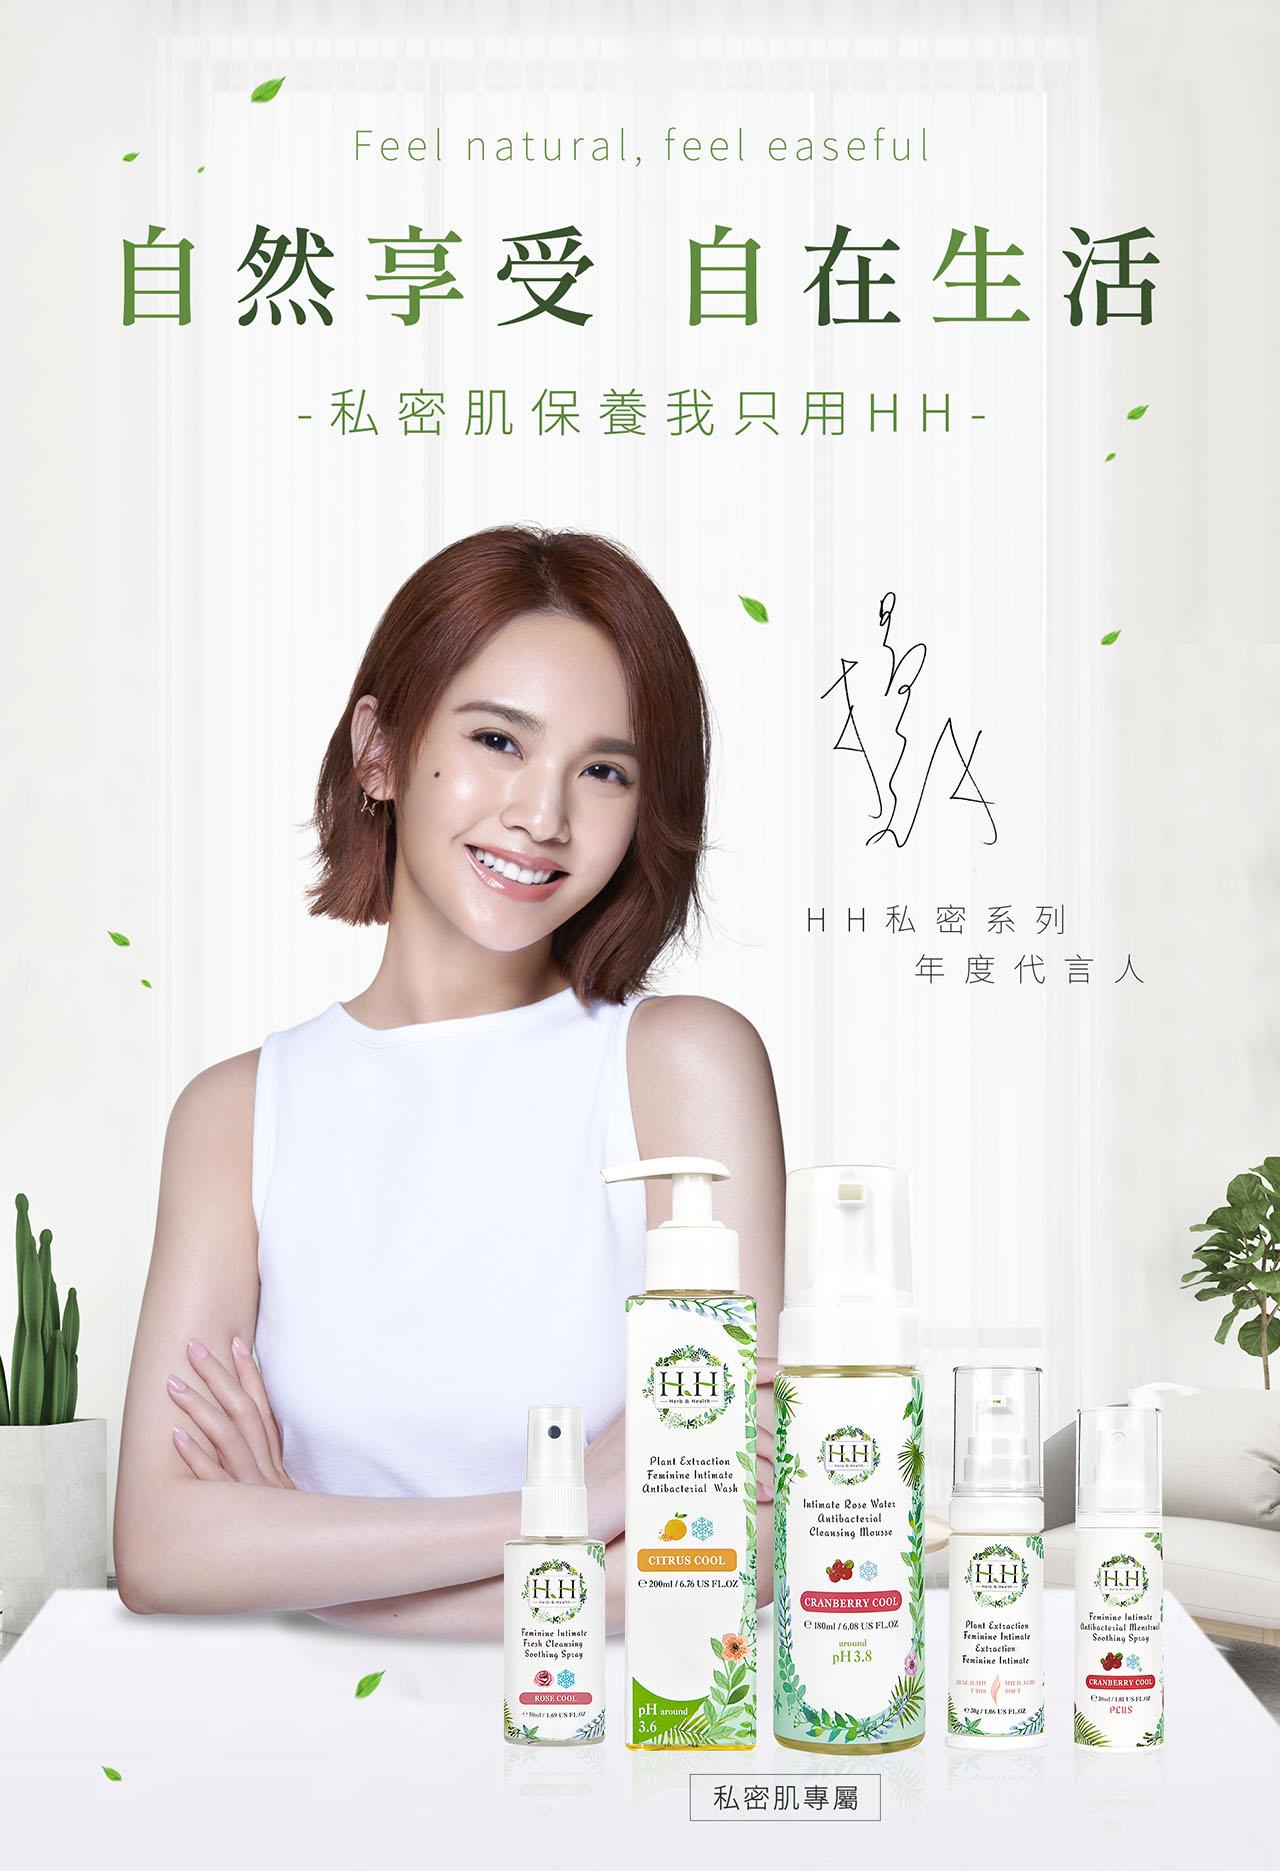 HH草本新淨界私密系列代言人楊丞琳,MIT台灣製私密品牌,採用自然精油與草本植萃,給私密肌最好的保養。